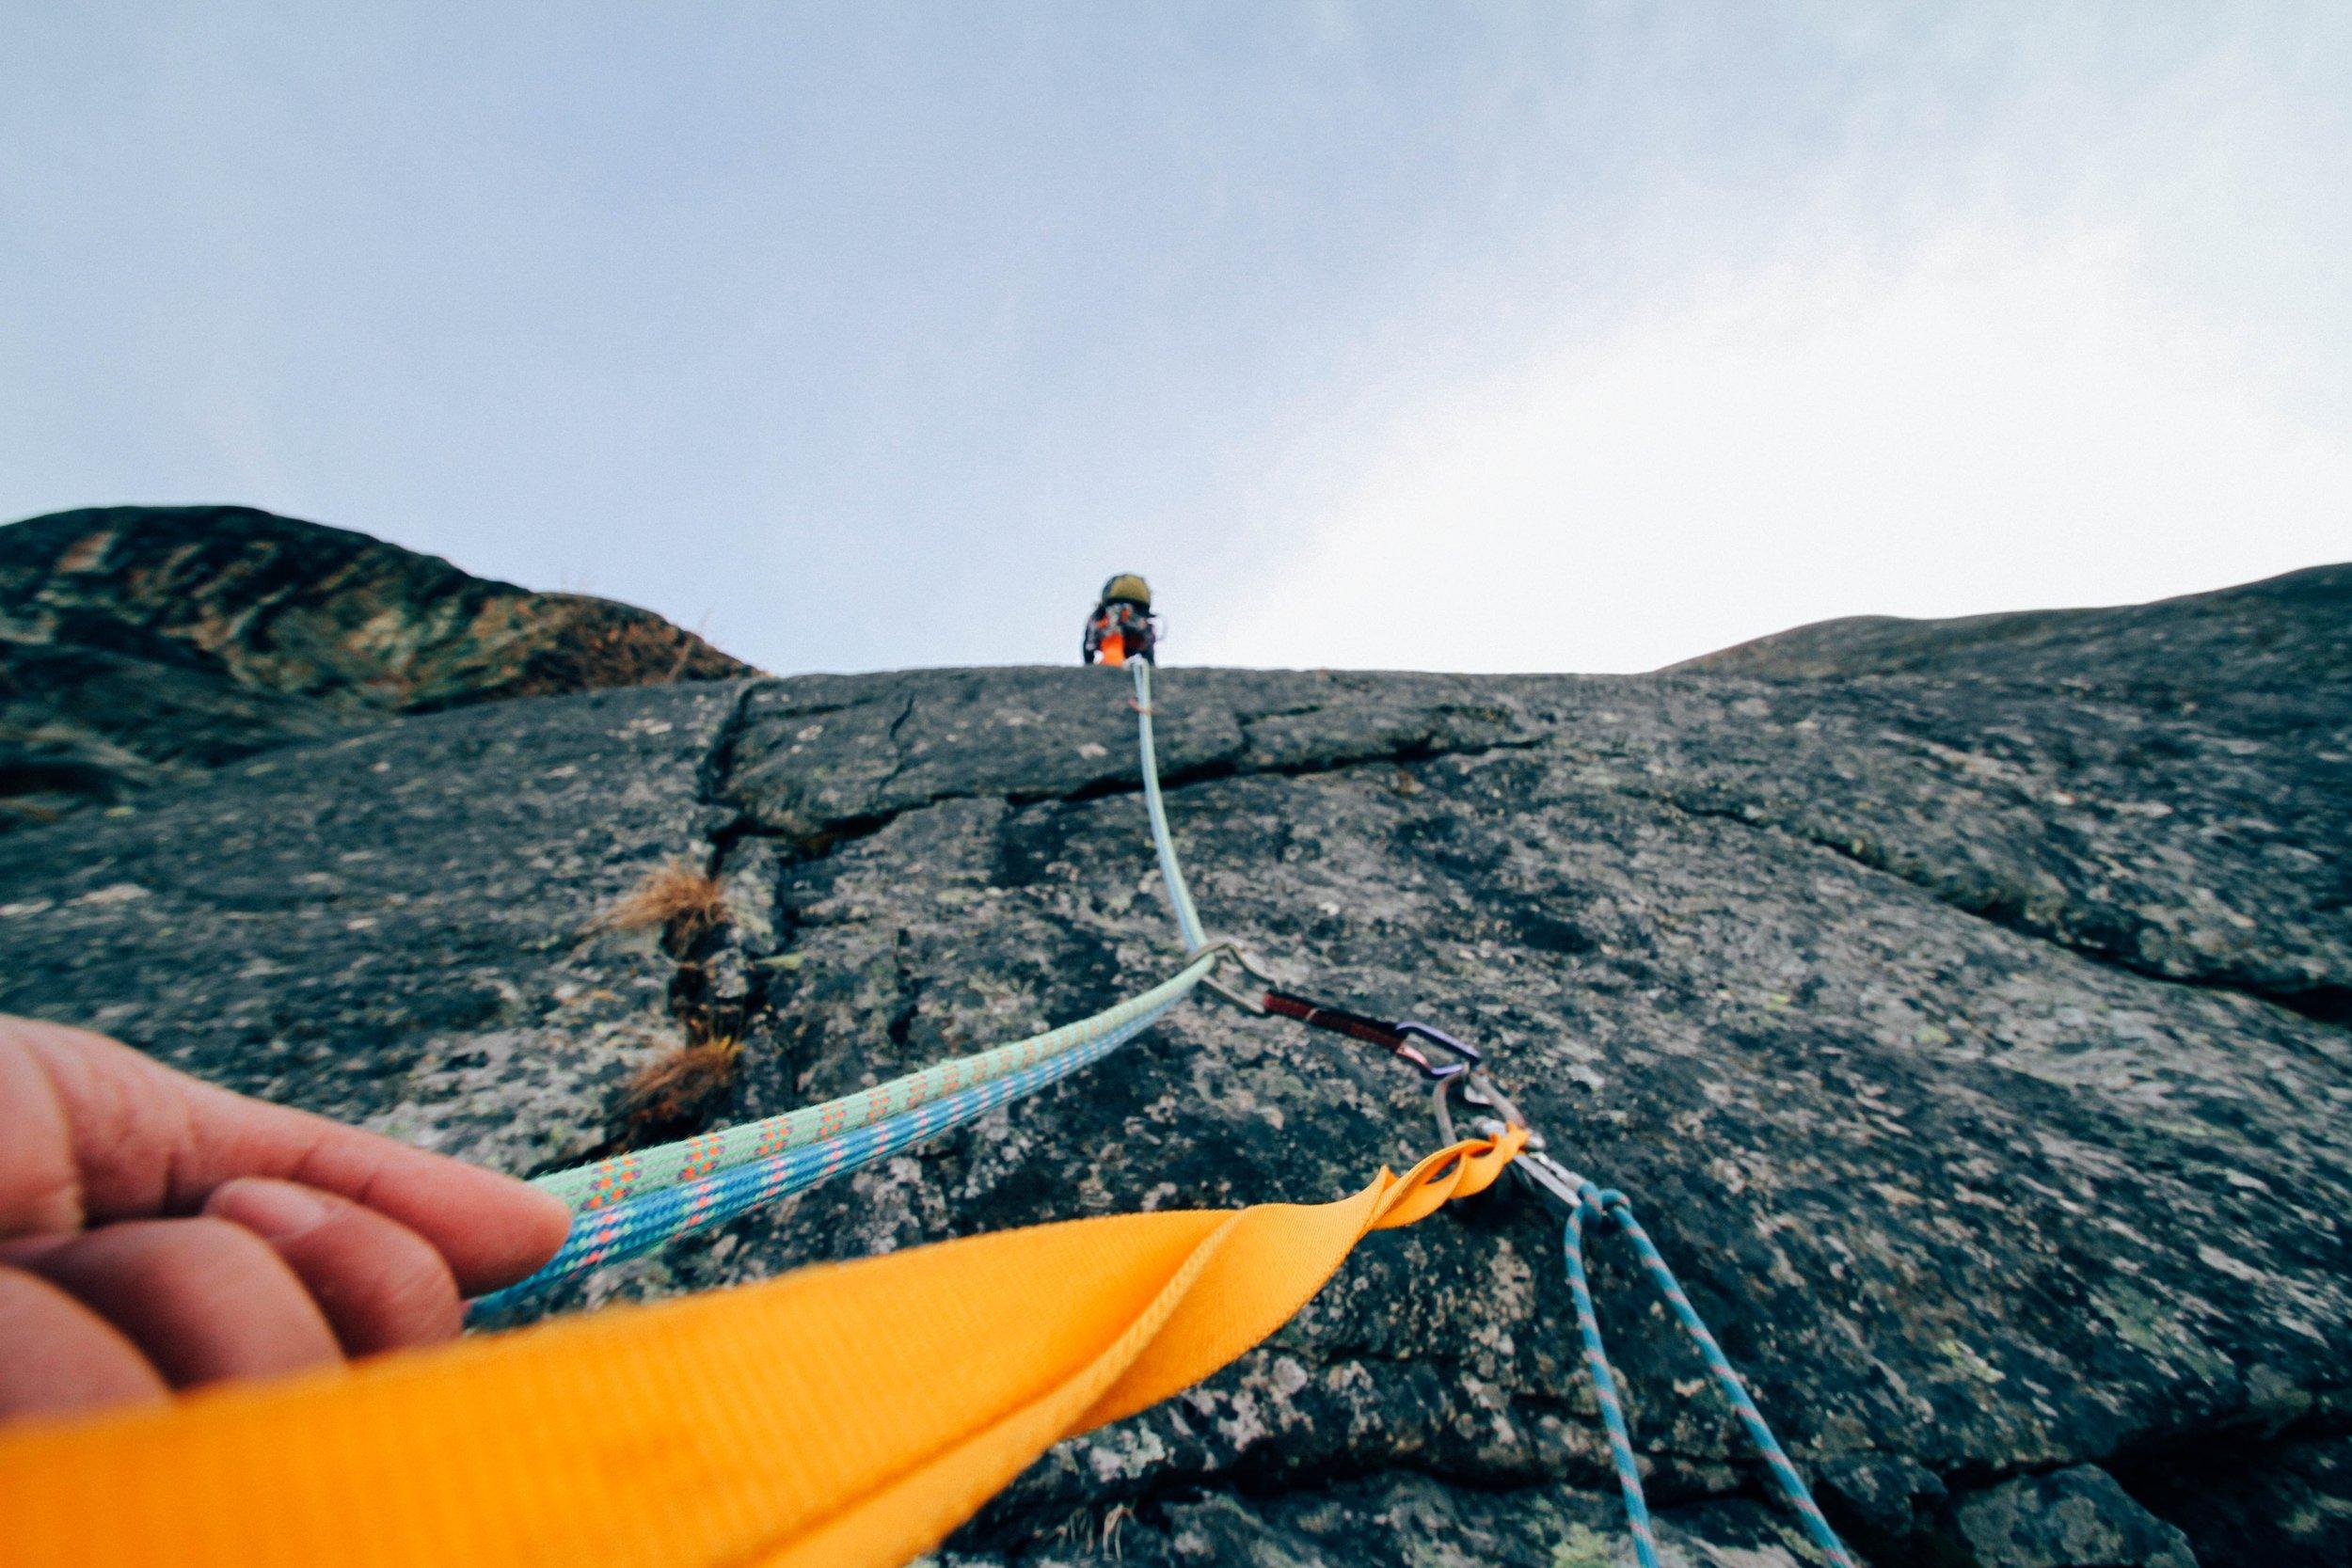 action-adventure-climbing-303040.jpg